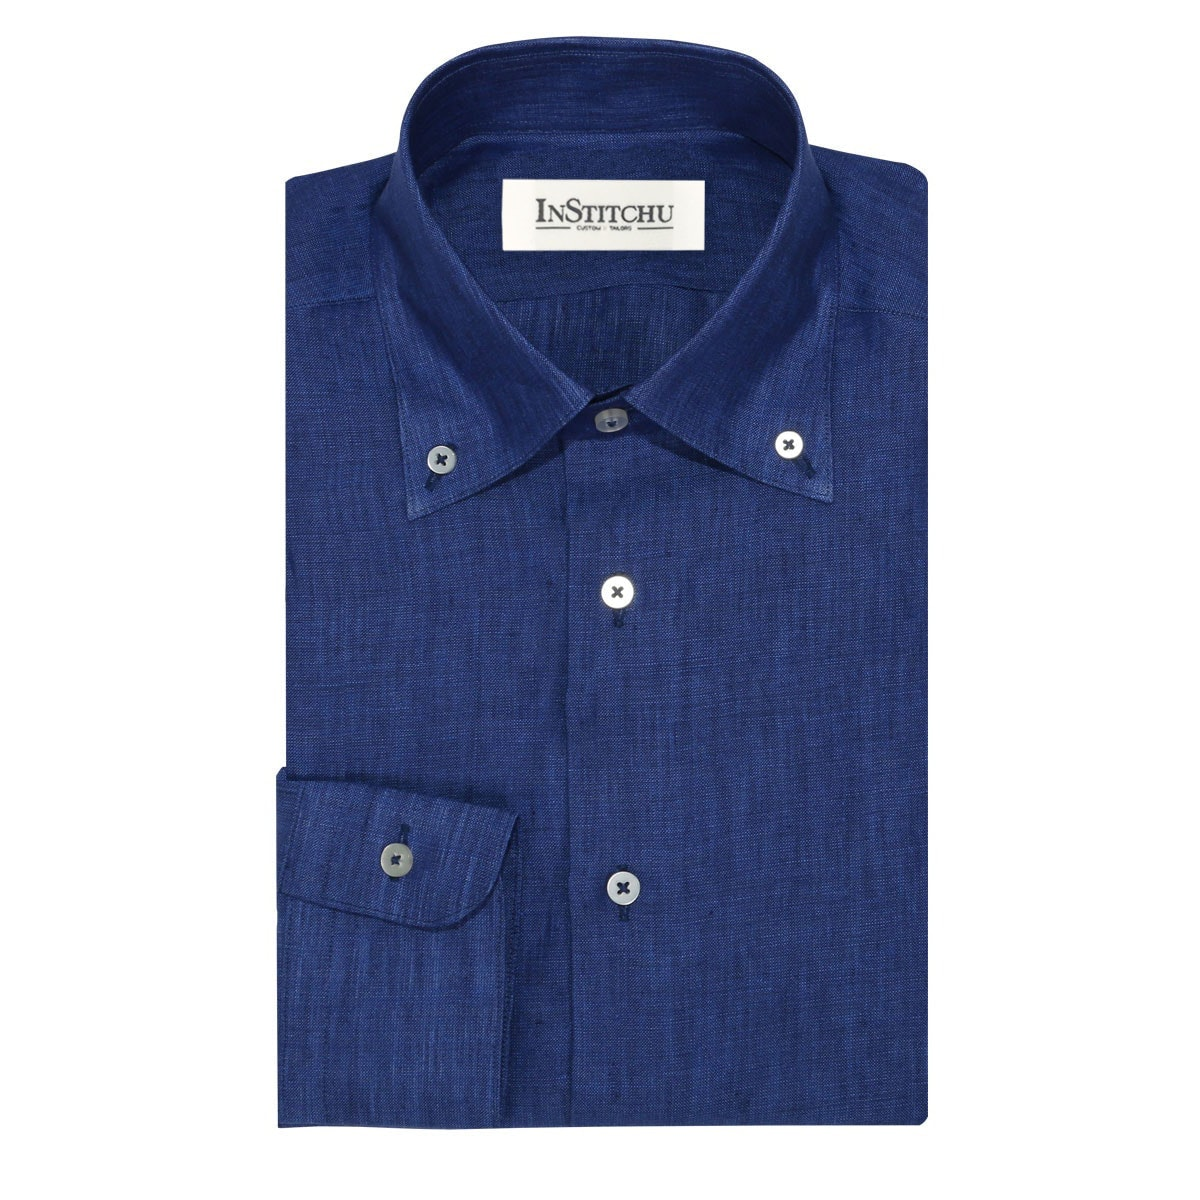 InStitchu Collection The Como Blue Linen Shirt